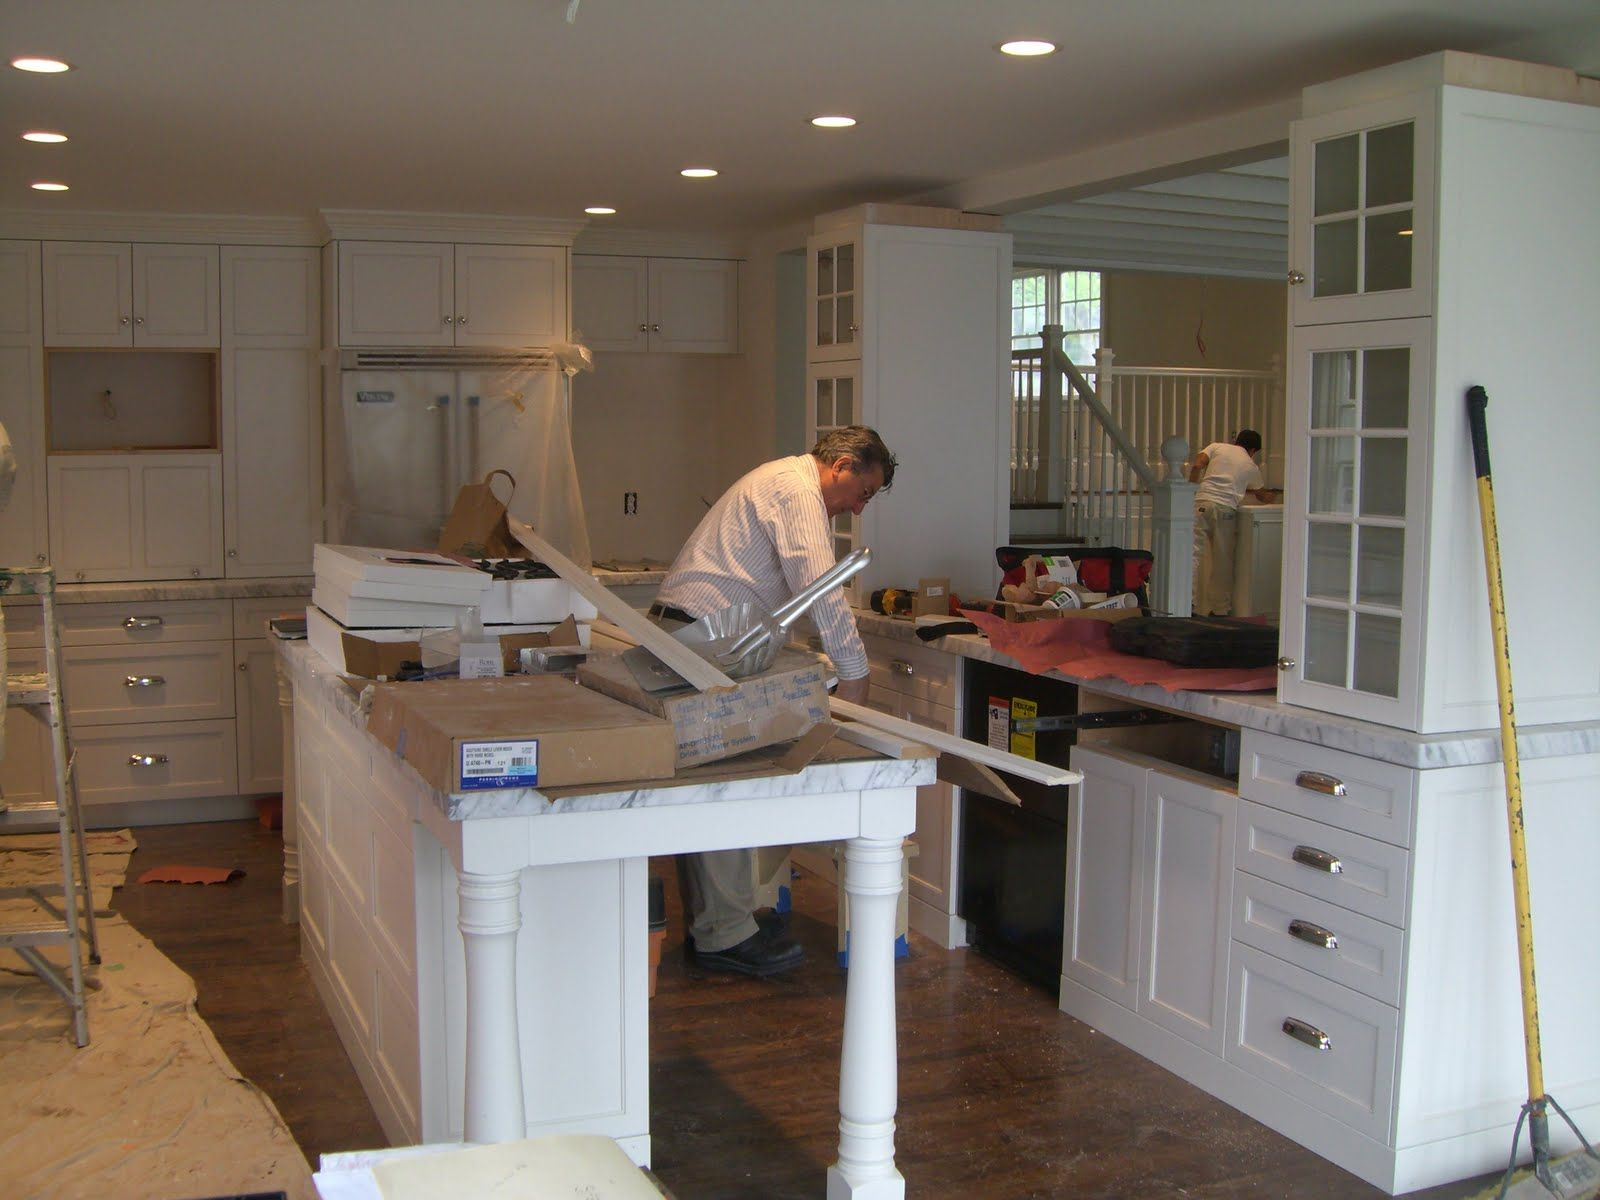 Molly Frey Design: Design Solution: Removing Kitchen Walls | For the on kitchen layout ideas google, kitchen island cabinets, kitchen with corner desk area, kitchen counter desk,